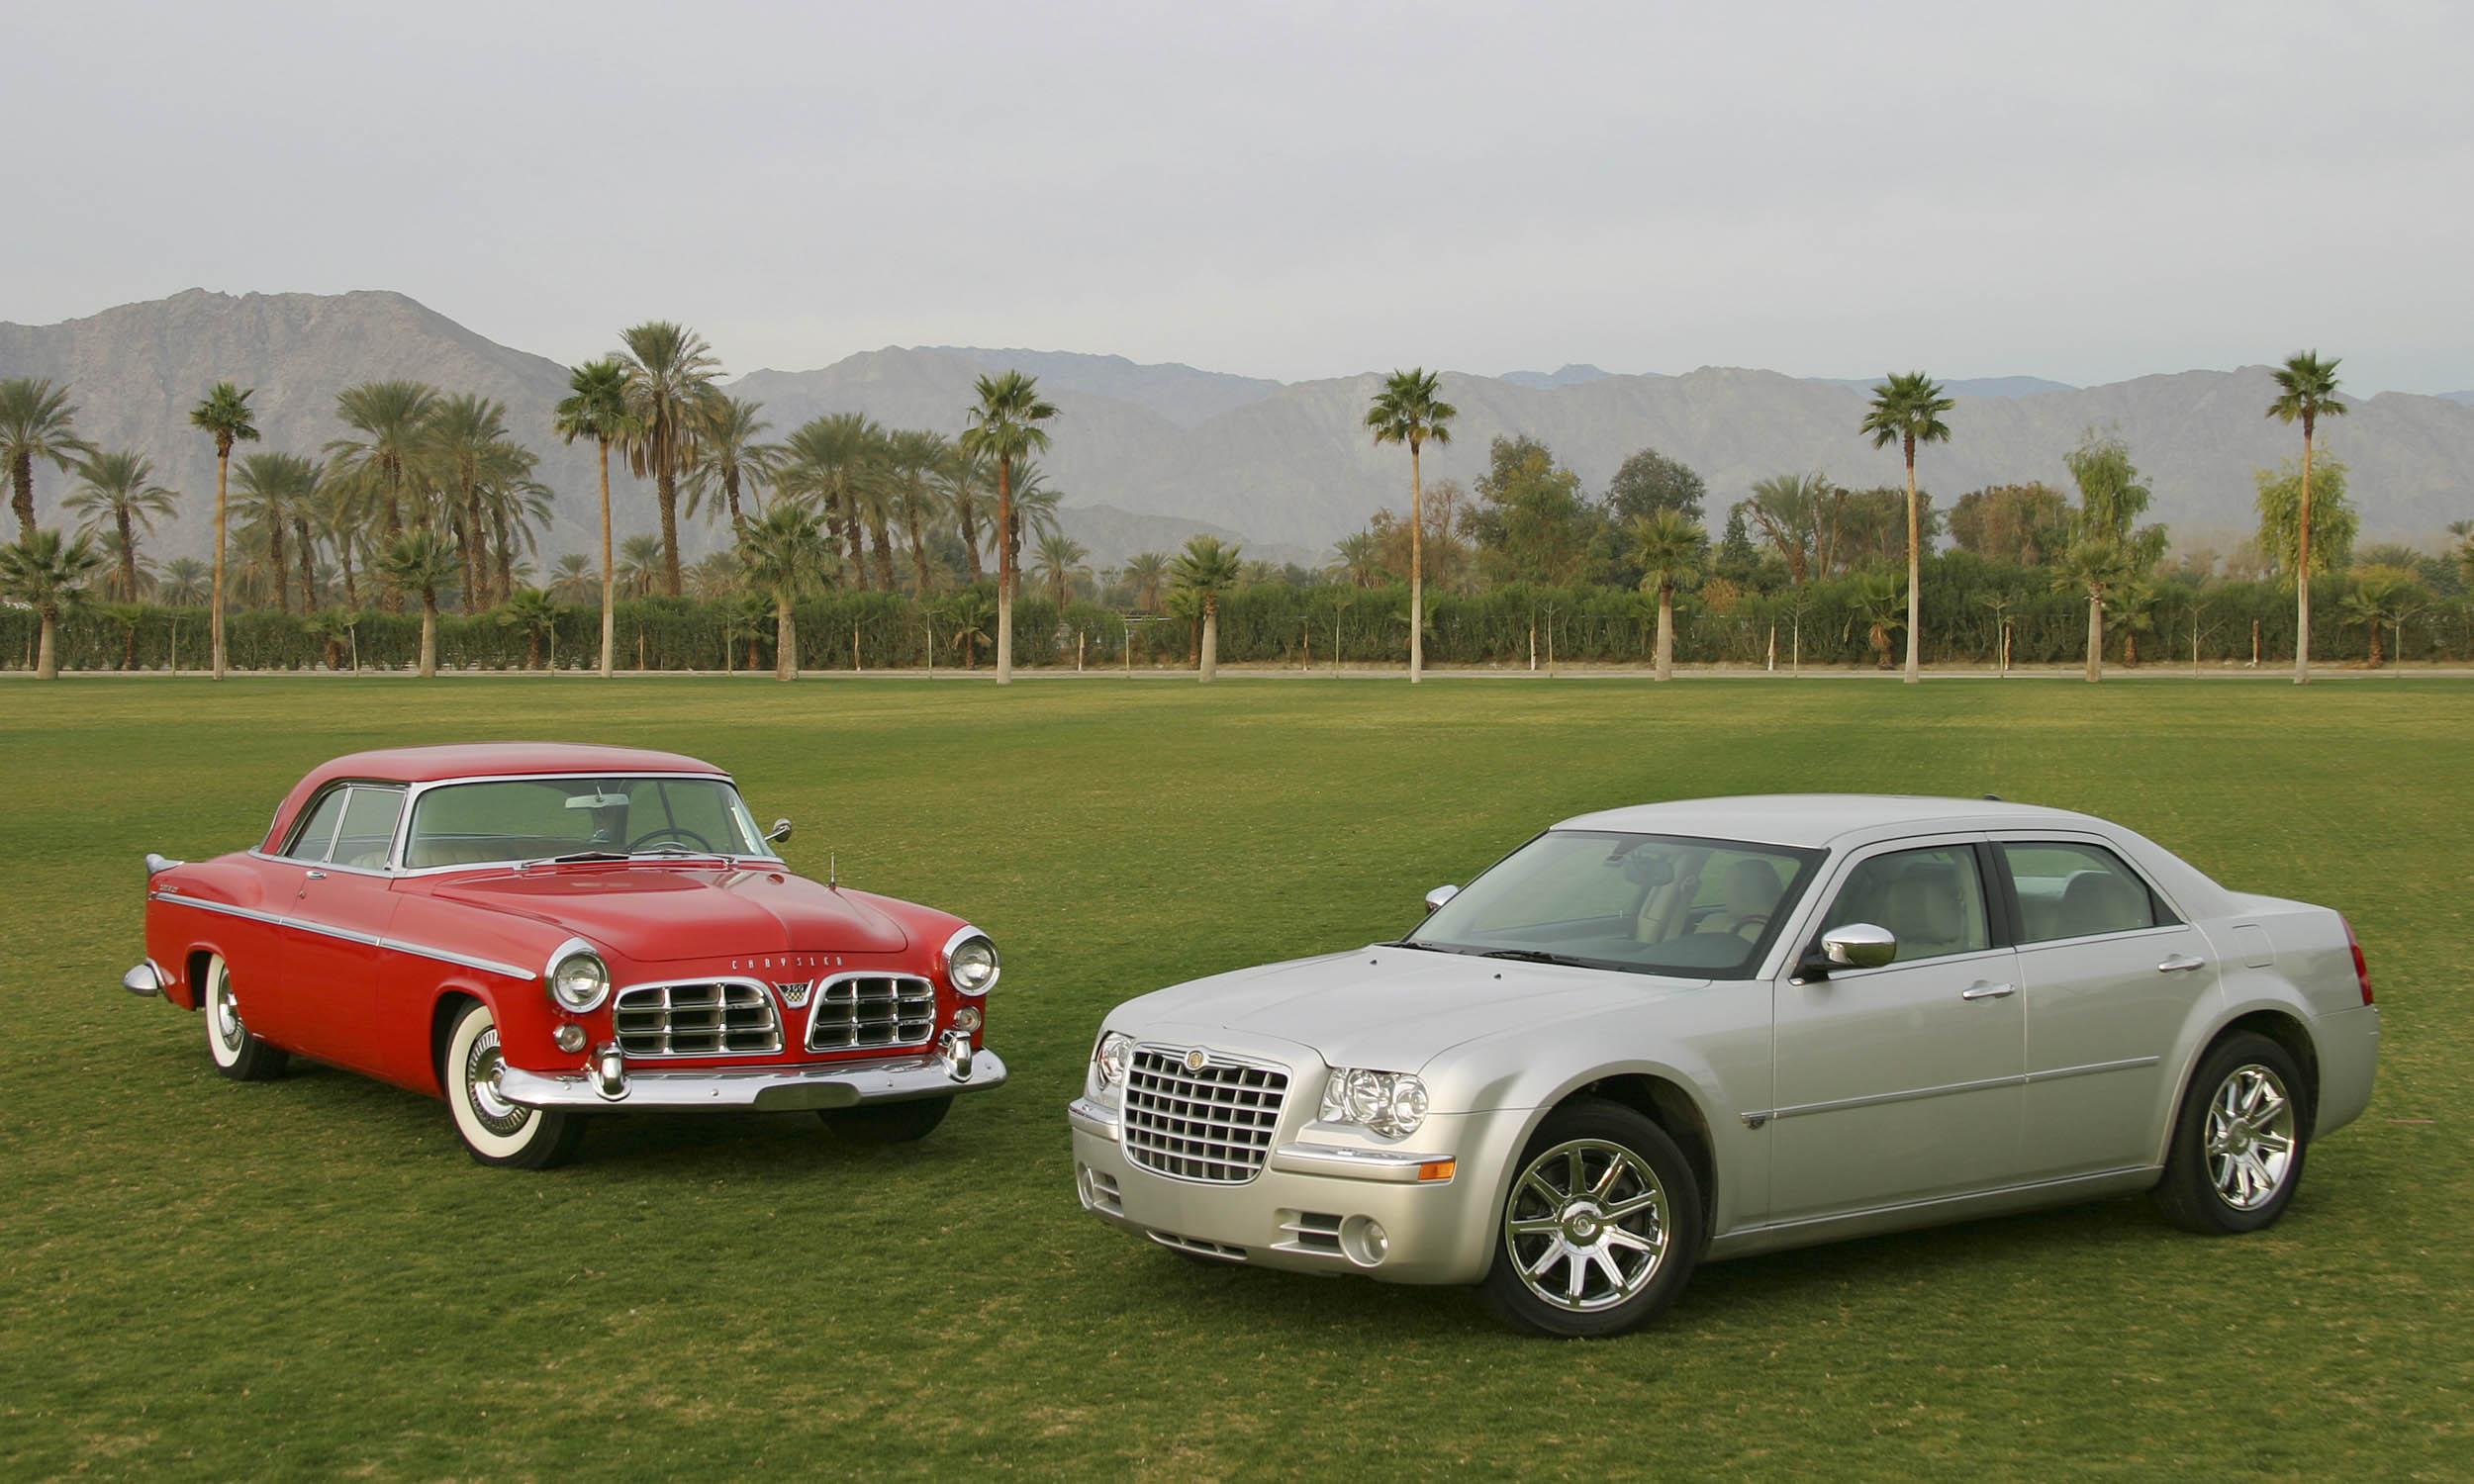 Chrysler 300 A Brief Historynbsp